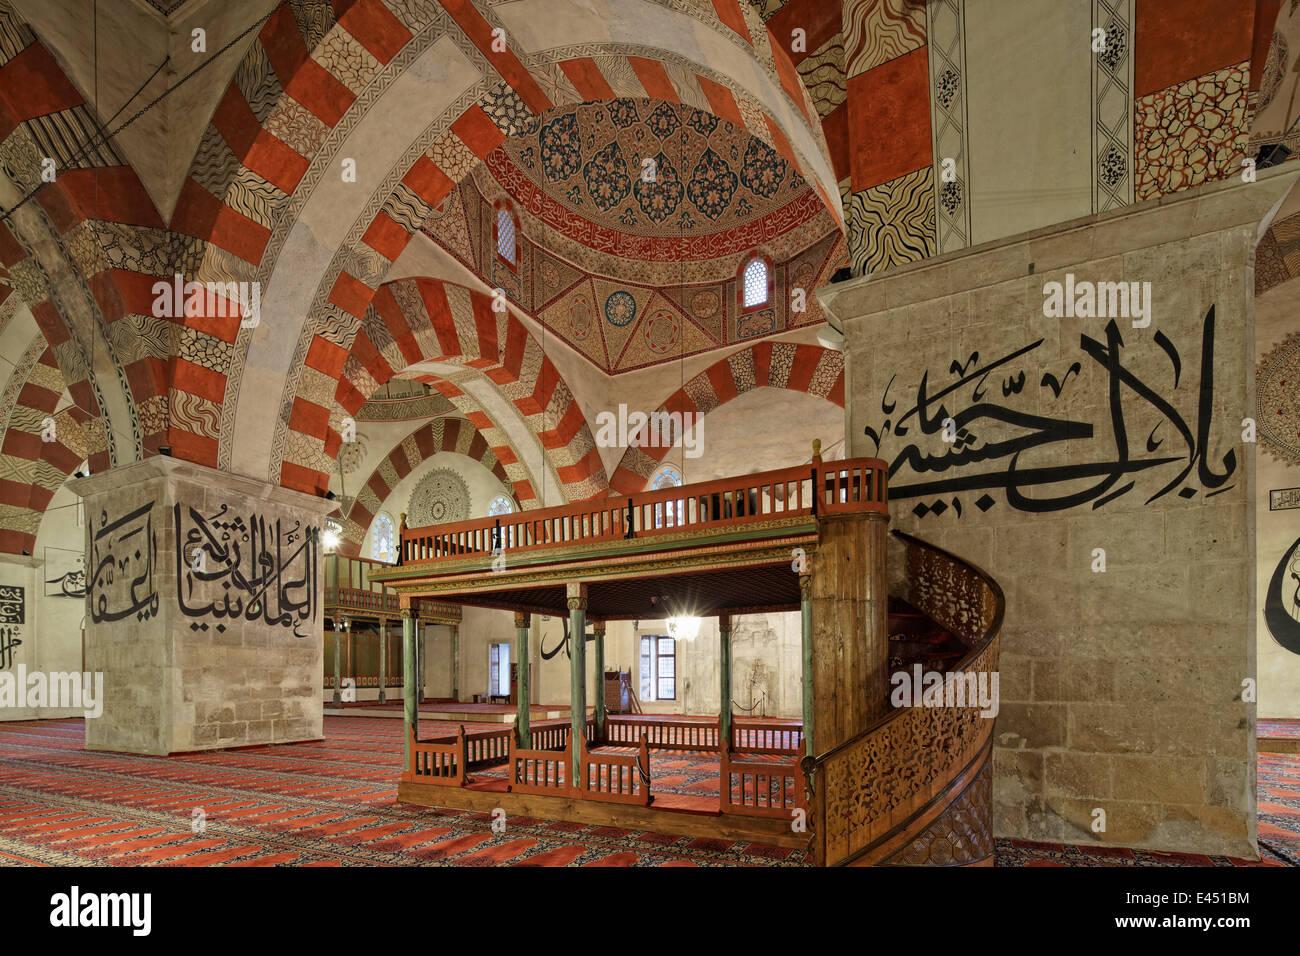 Rostrum of a prayer leader, Old Mosque, Eski Camii, Edirne, East Thrace, Turkey - Stock Image